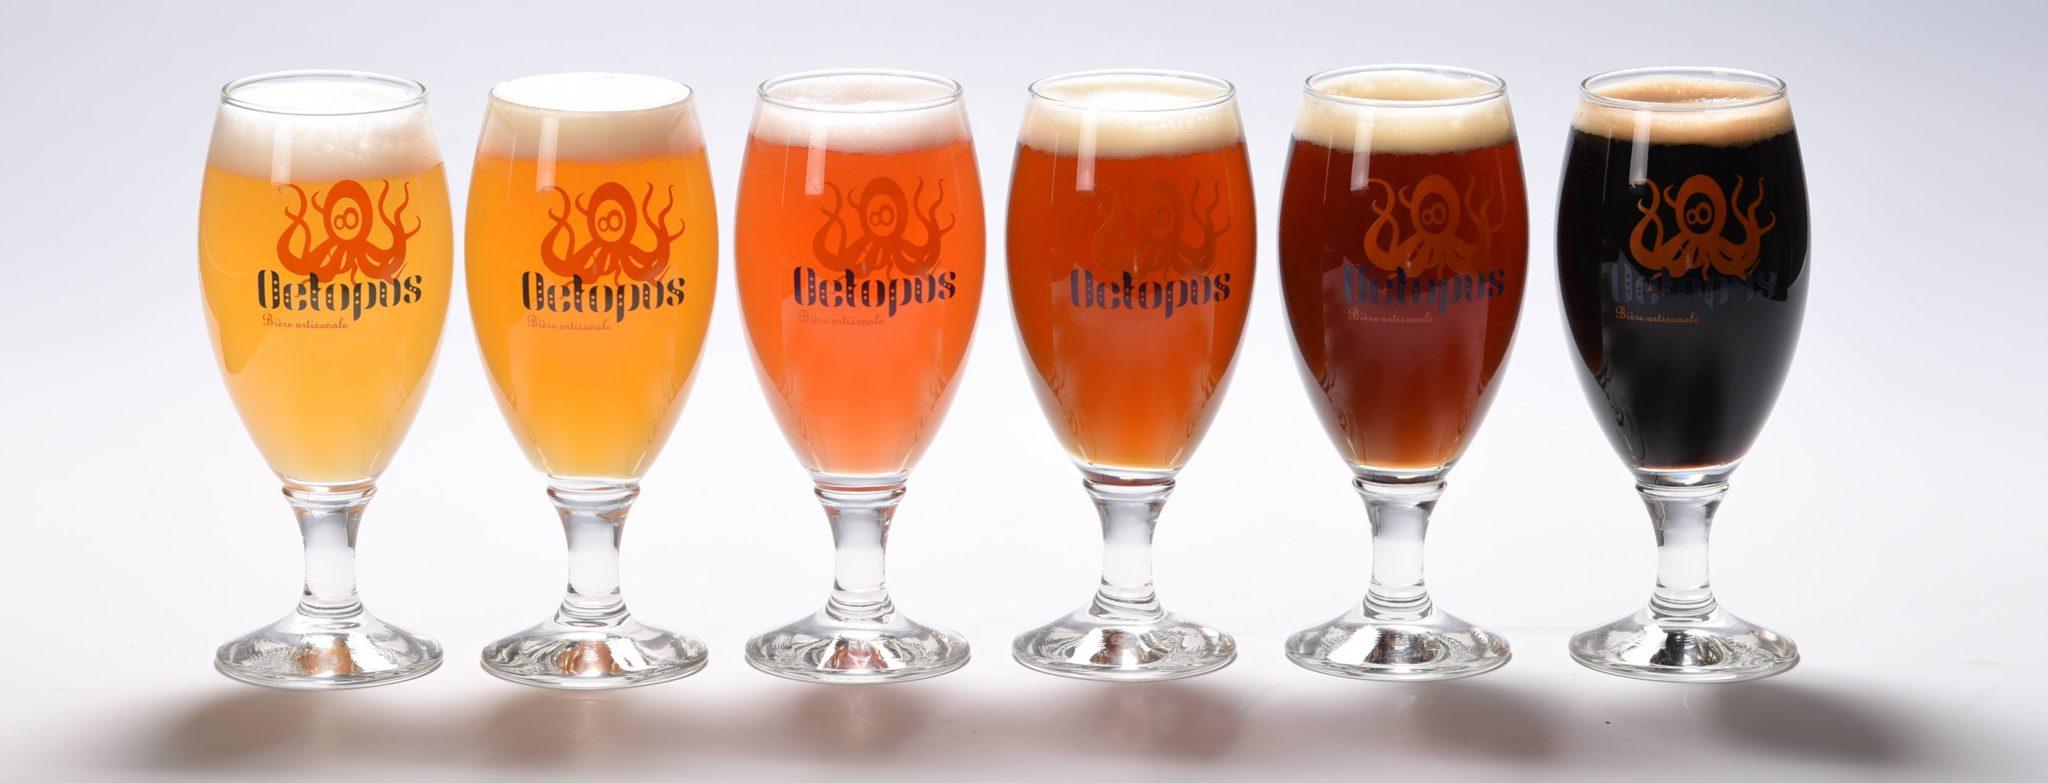 bière brasserie octopus